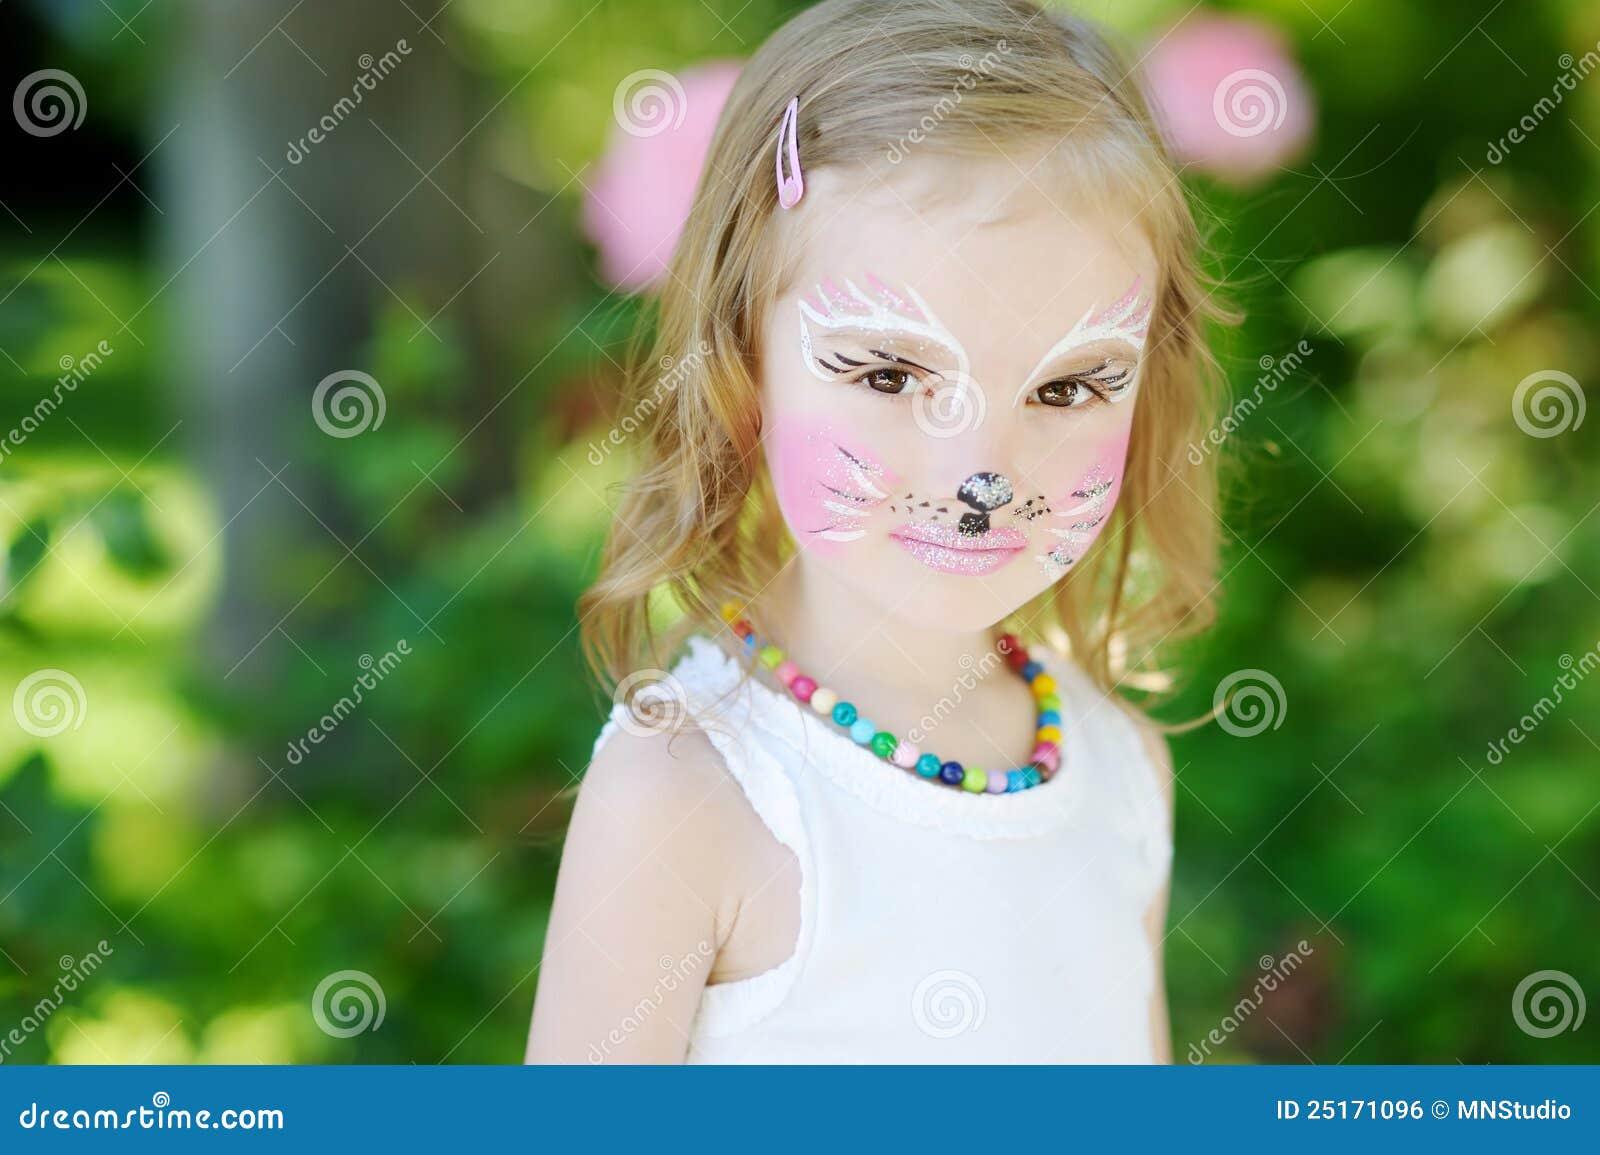 Niña Adorable Con Su Cara Pintada Foto de archivo - Imagen de cara ...